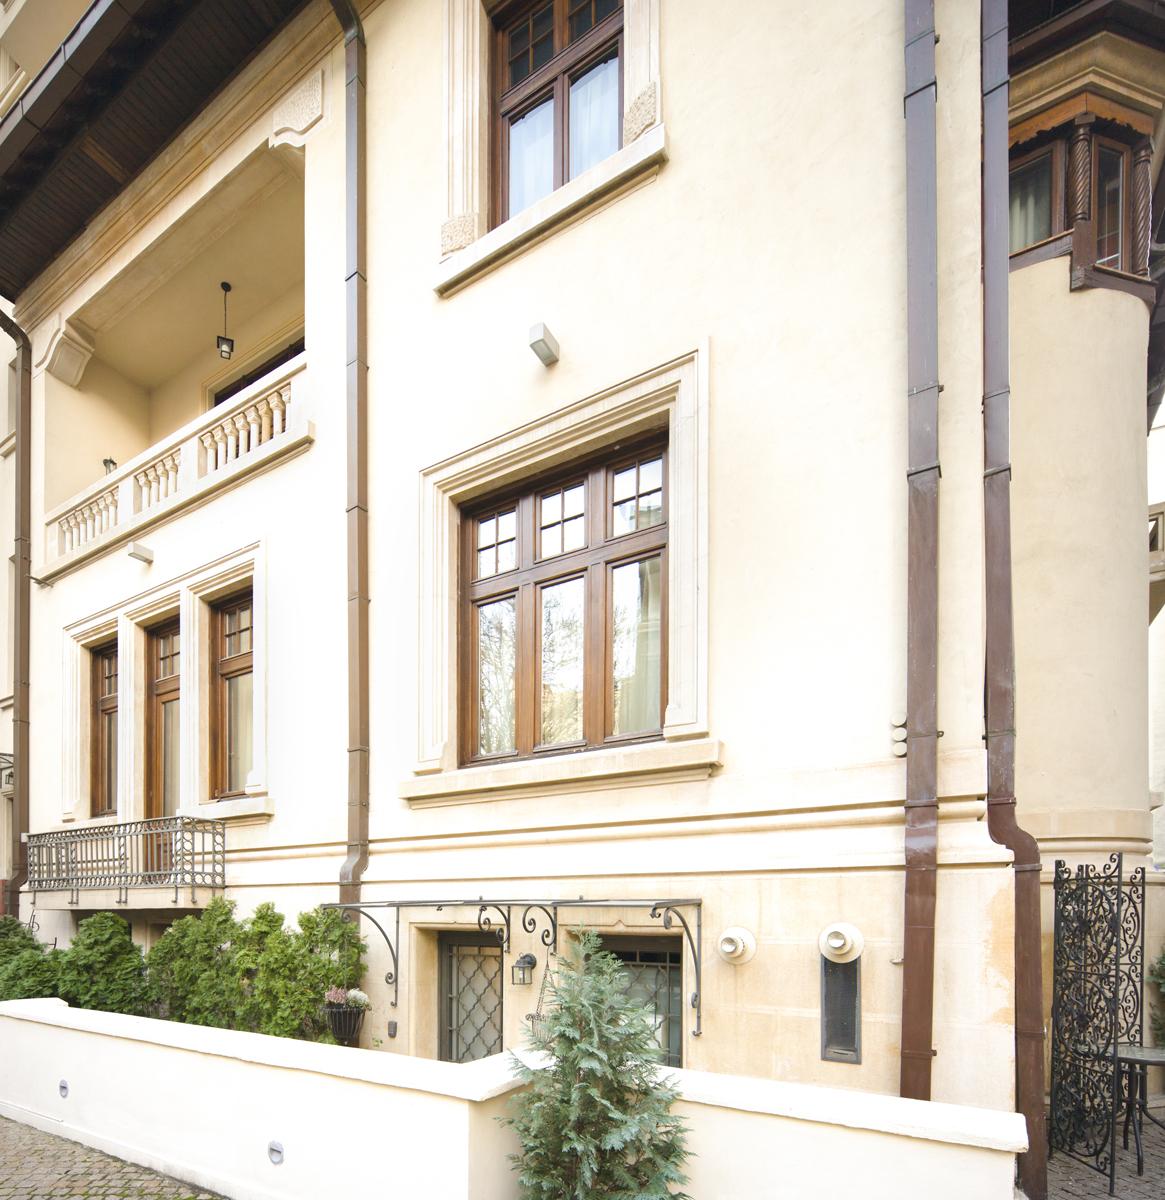 https://ahe-ro.s3.amazonaws.com/6123/Boutique-Hotel-Scala-Bucure%C8%99ti-arh.-Gh.-Simotta-%282%29.jpg